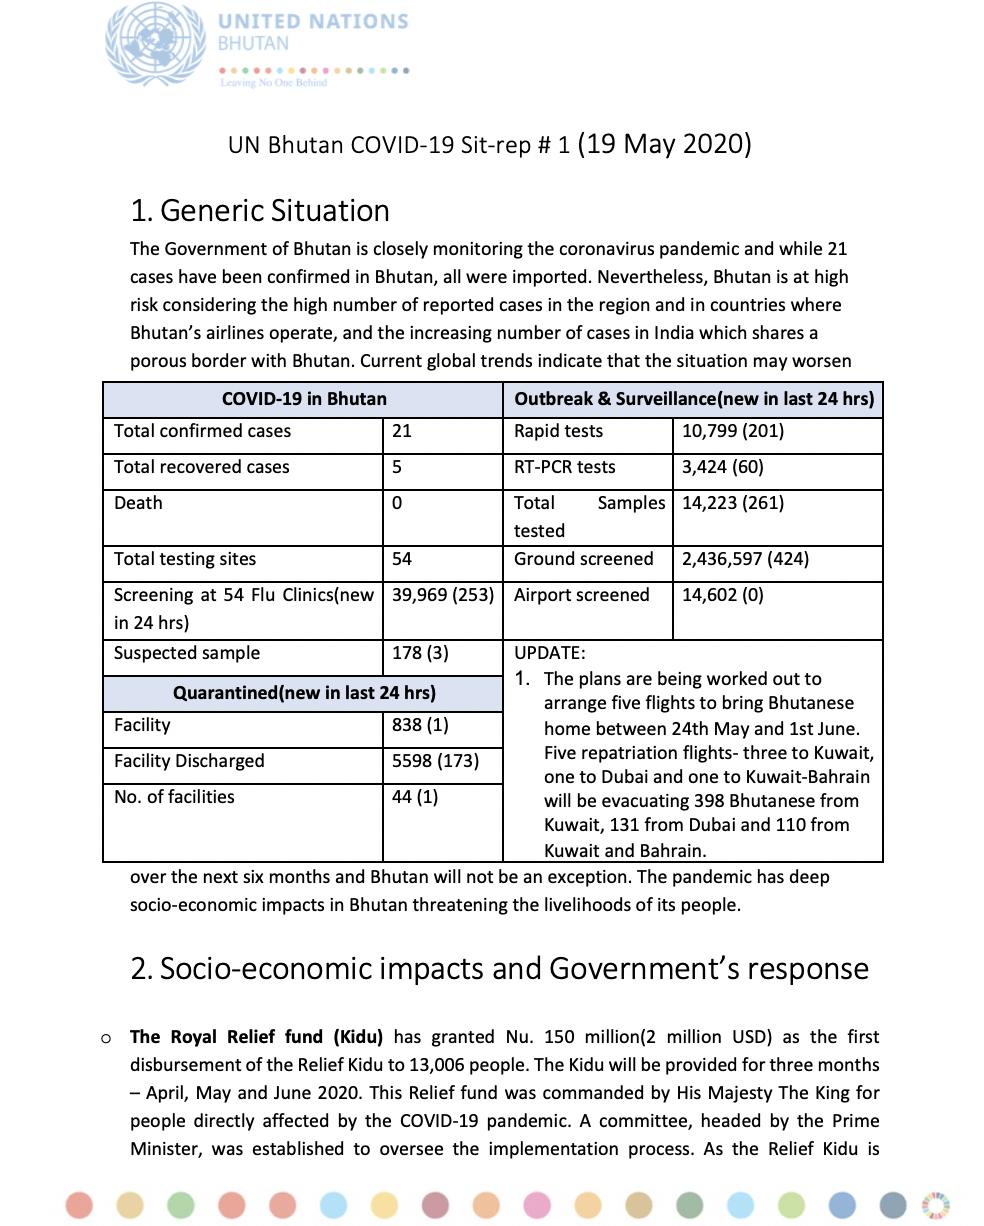 UN Bhutan COVID-19 Sitrep #1 – May